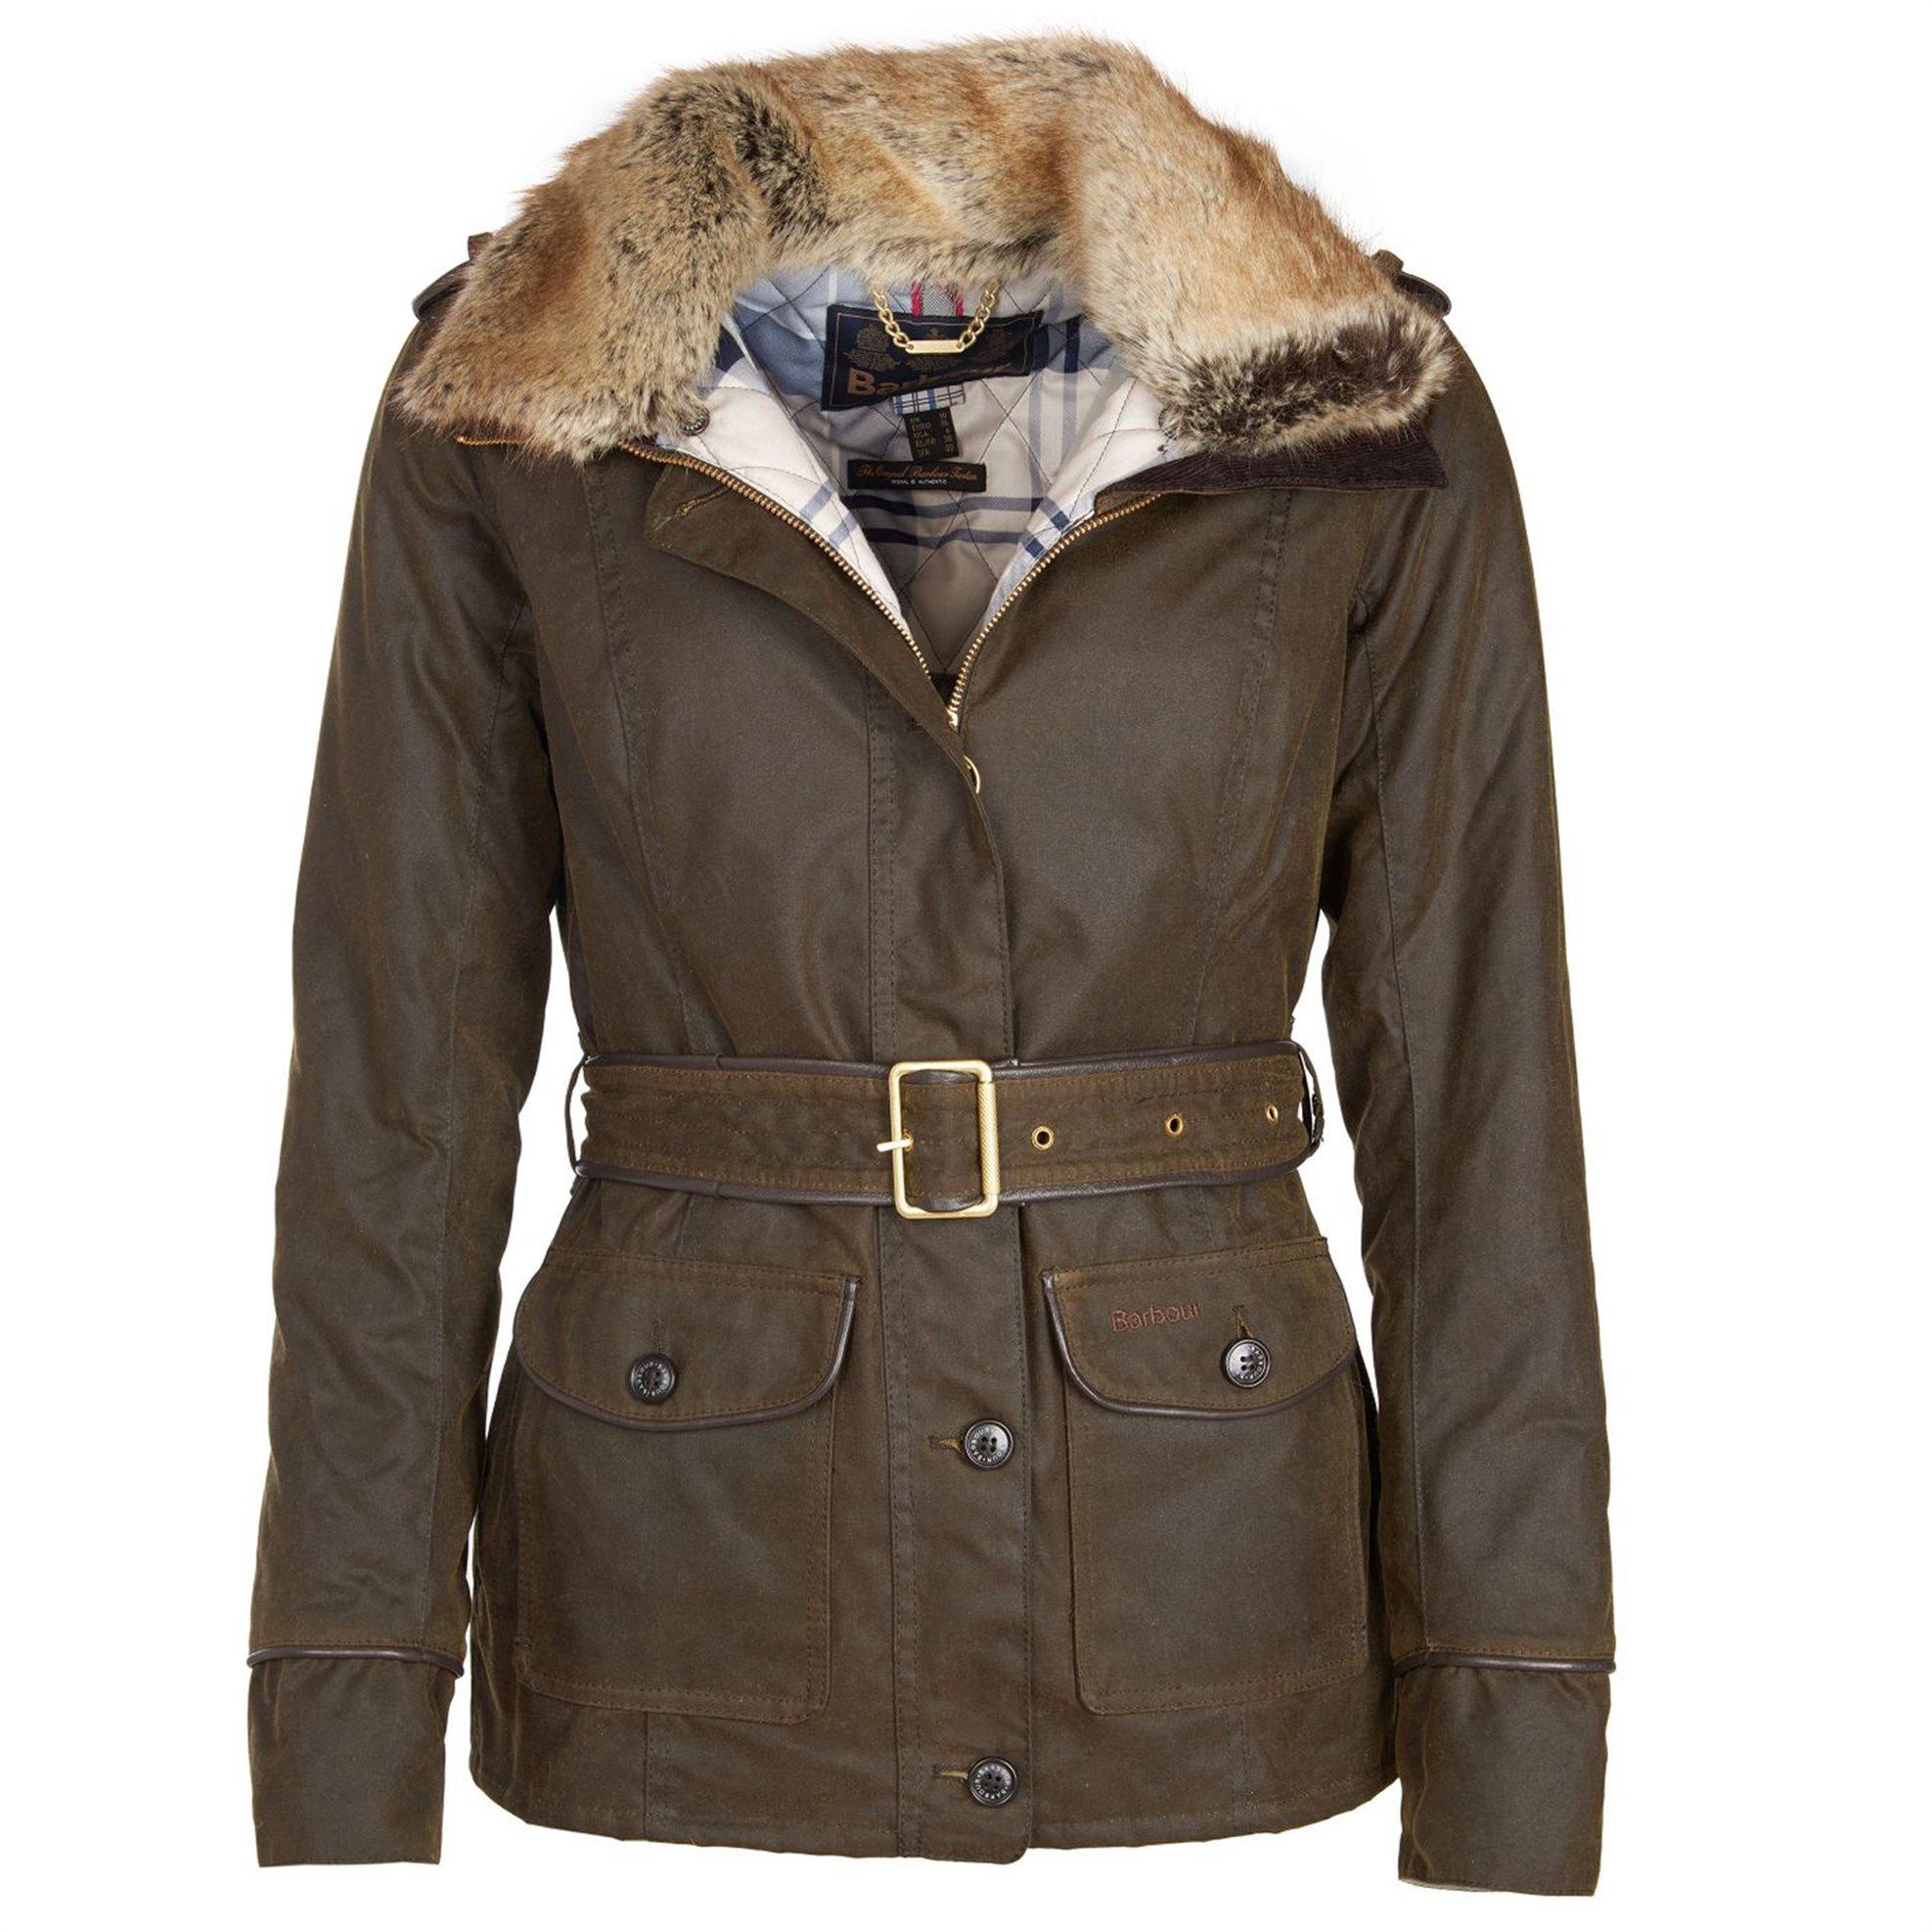 Barbour γυναικείο μπουφάν Stirling με κουκούλα - LWX0872 - Λαδί γυναικα   ρουχα   πανωφόρια   μπουφάν   σακάκια   μπουφάν